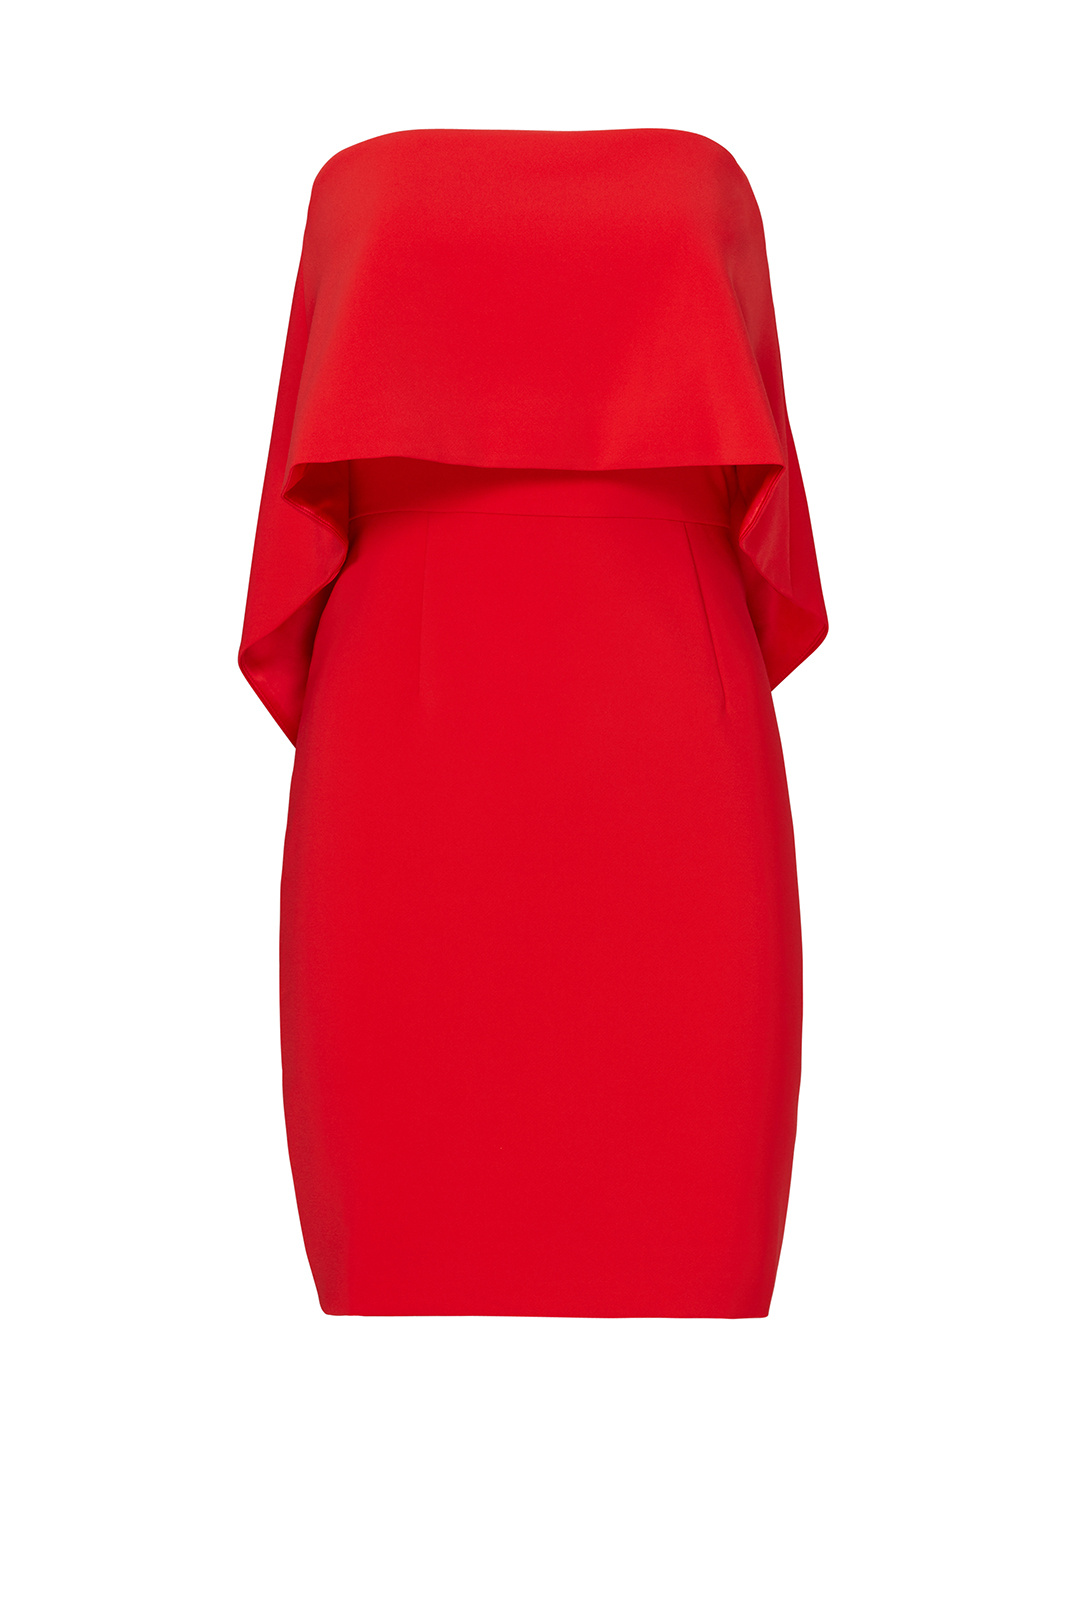 Jay Godfrey Red Dress.jpg